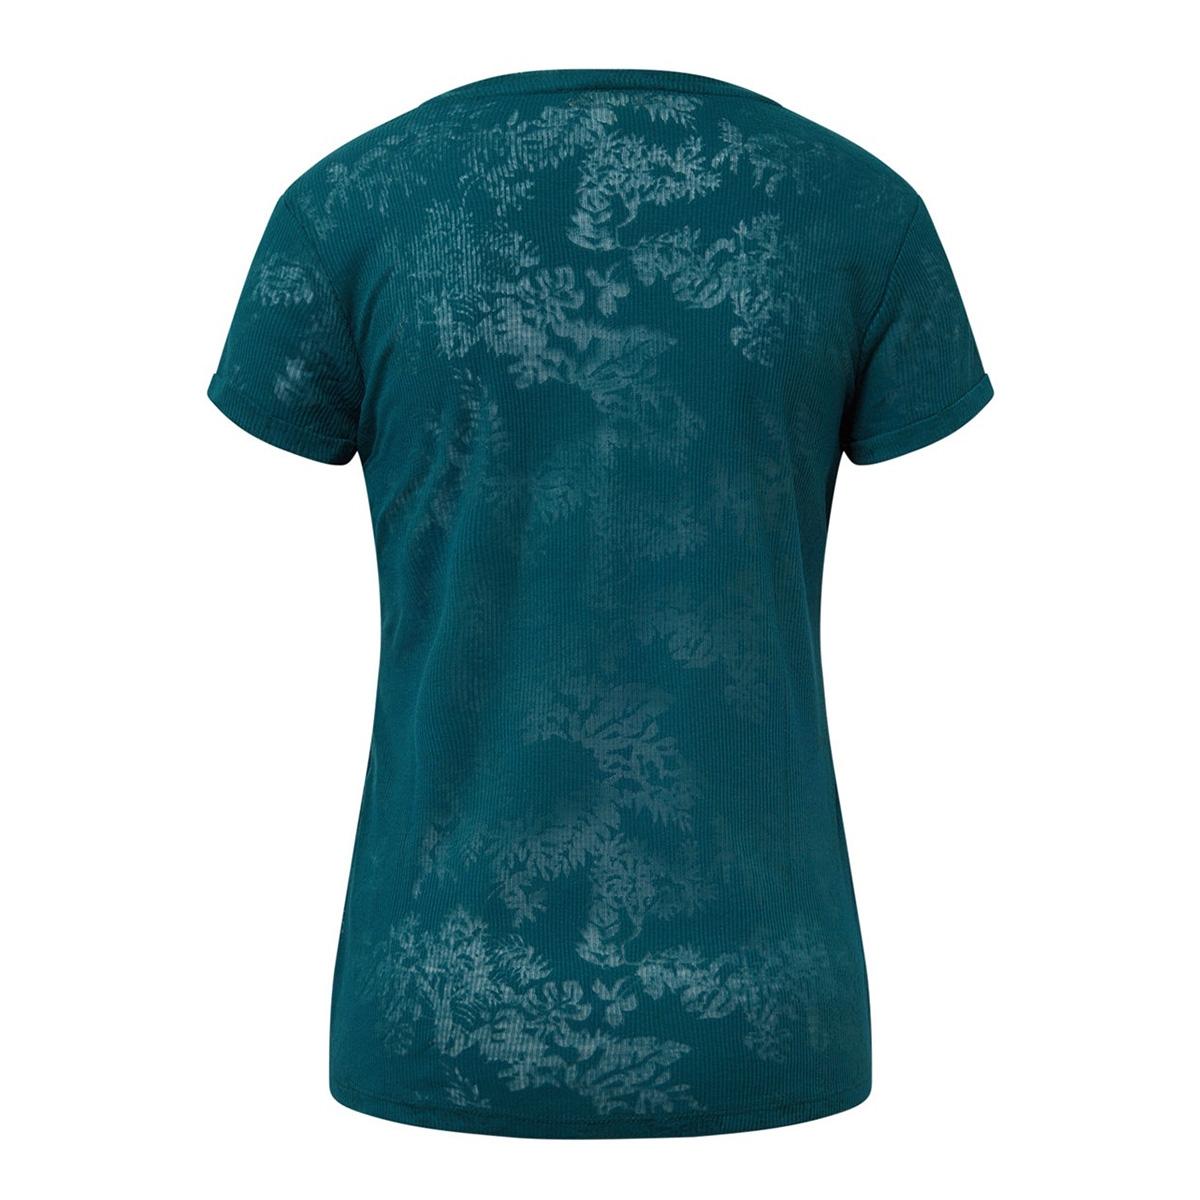 t shirt met motief 1010912xx71 tom tailor t-shirt 20038